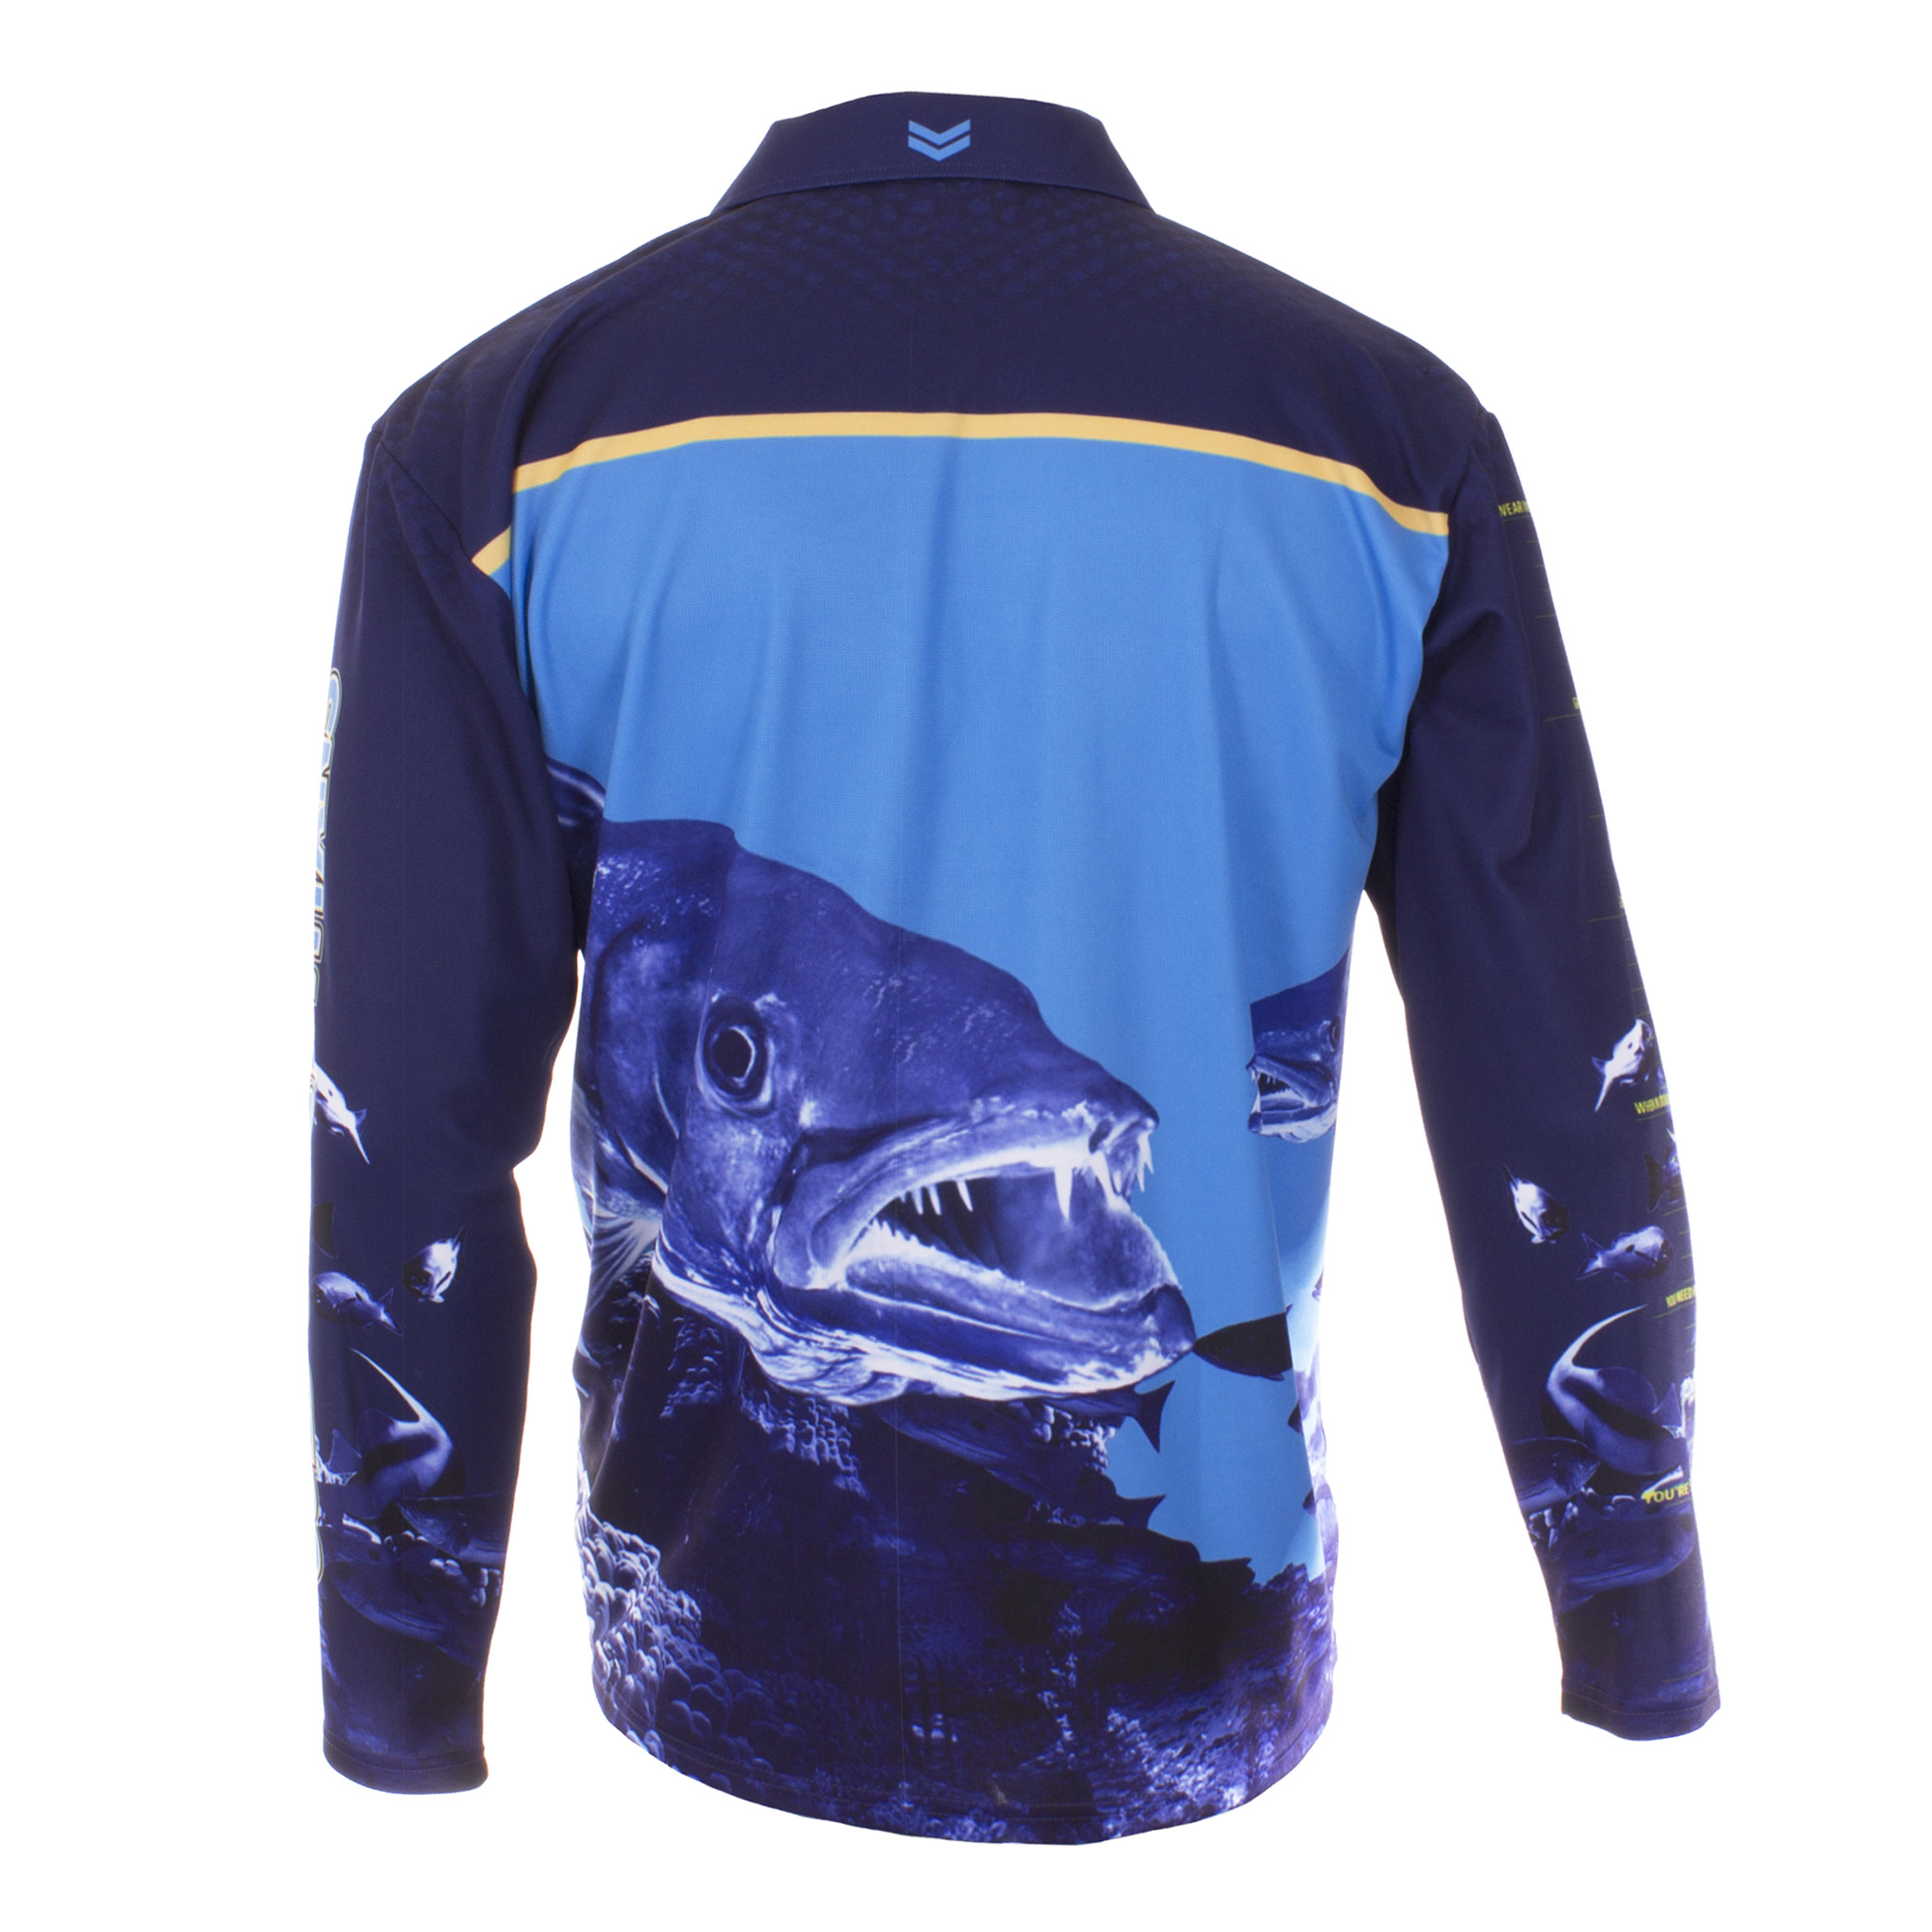 Personalised NRL Titans Fishing Shirt - Back View